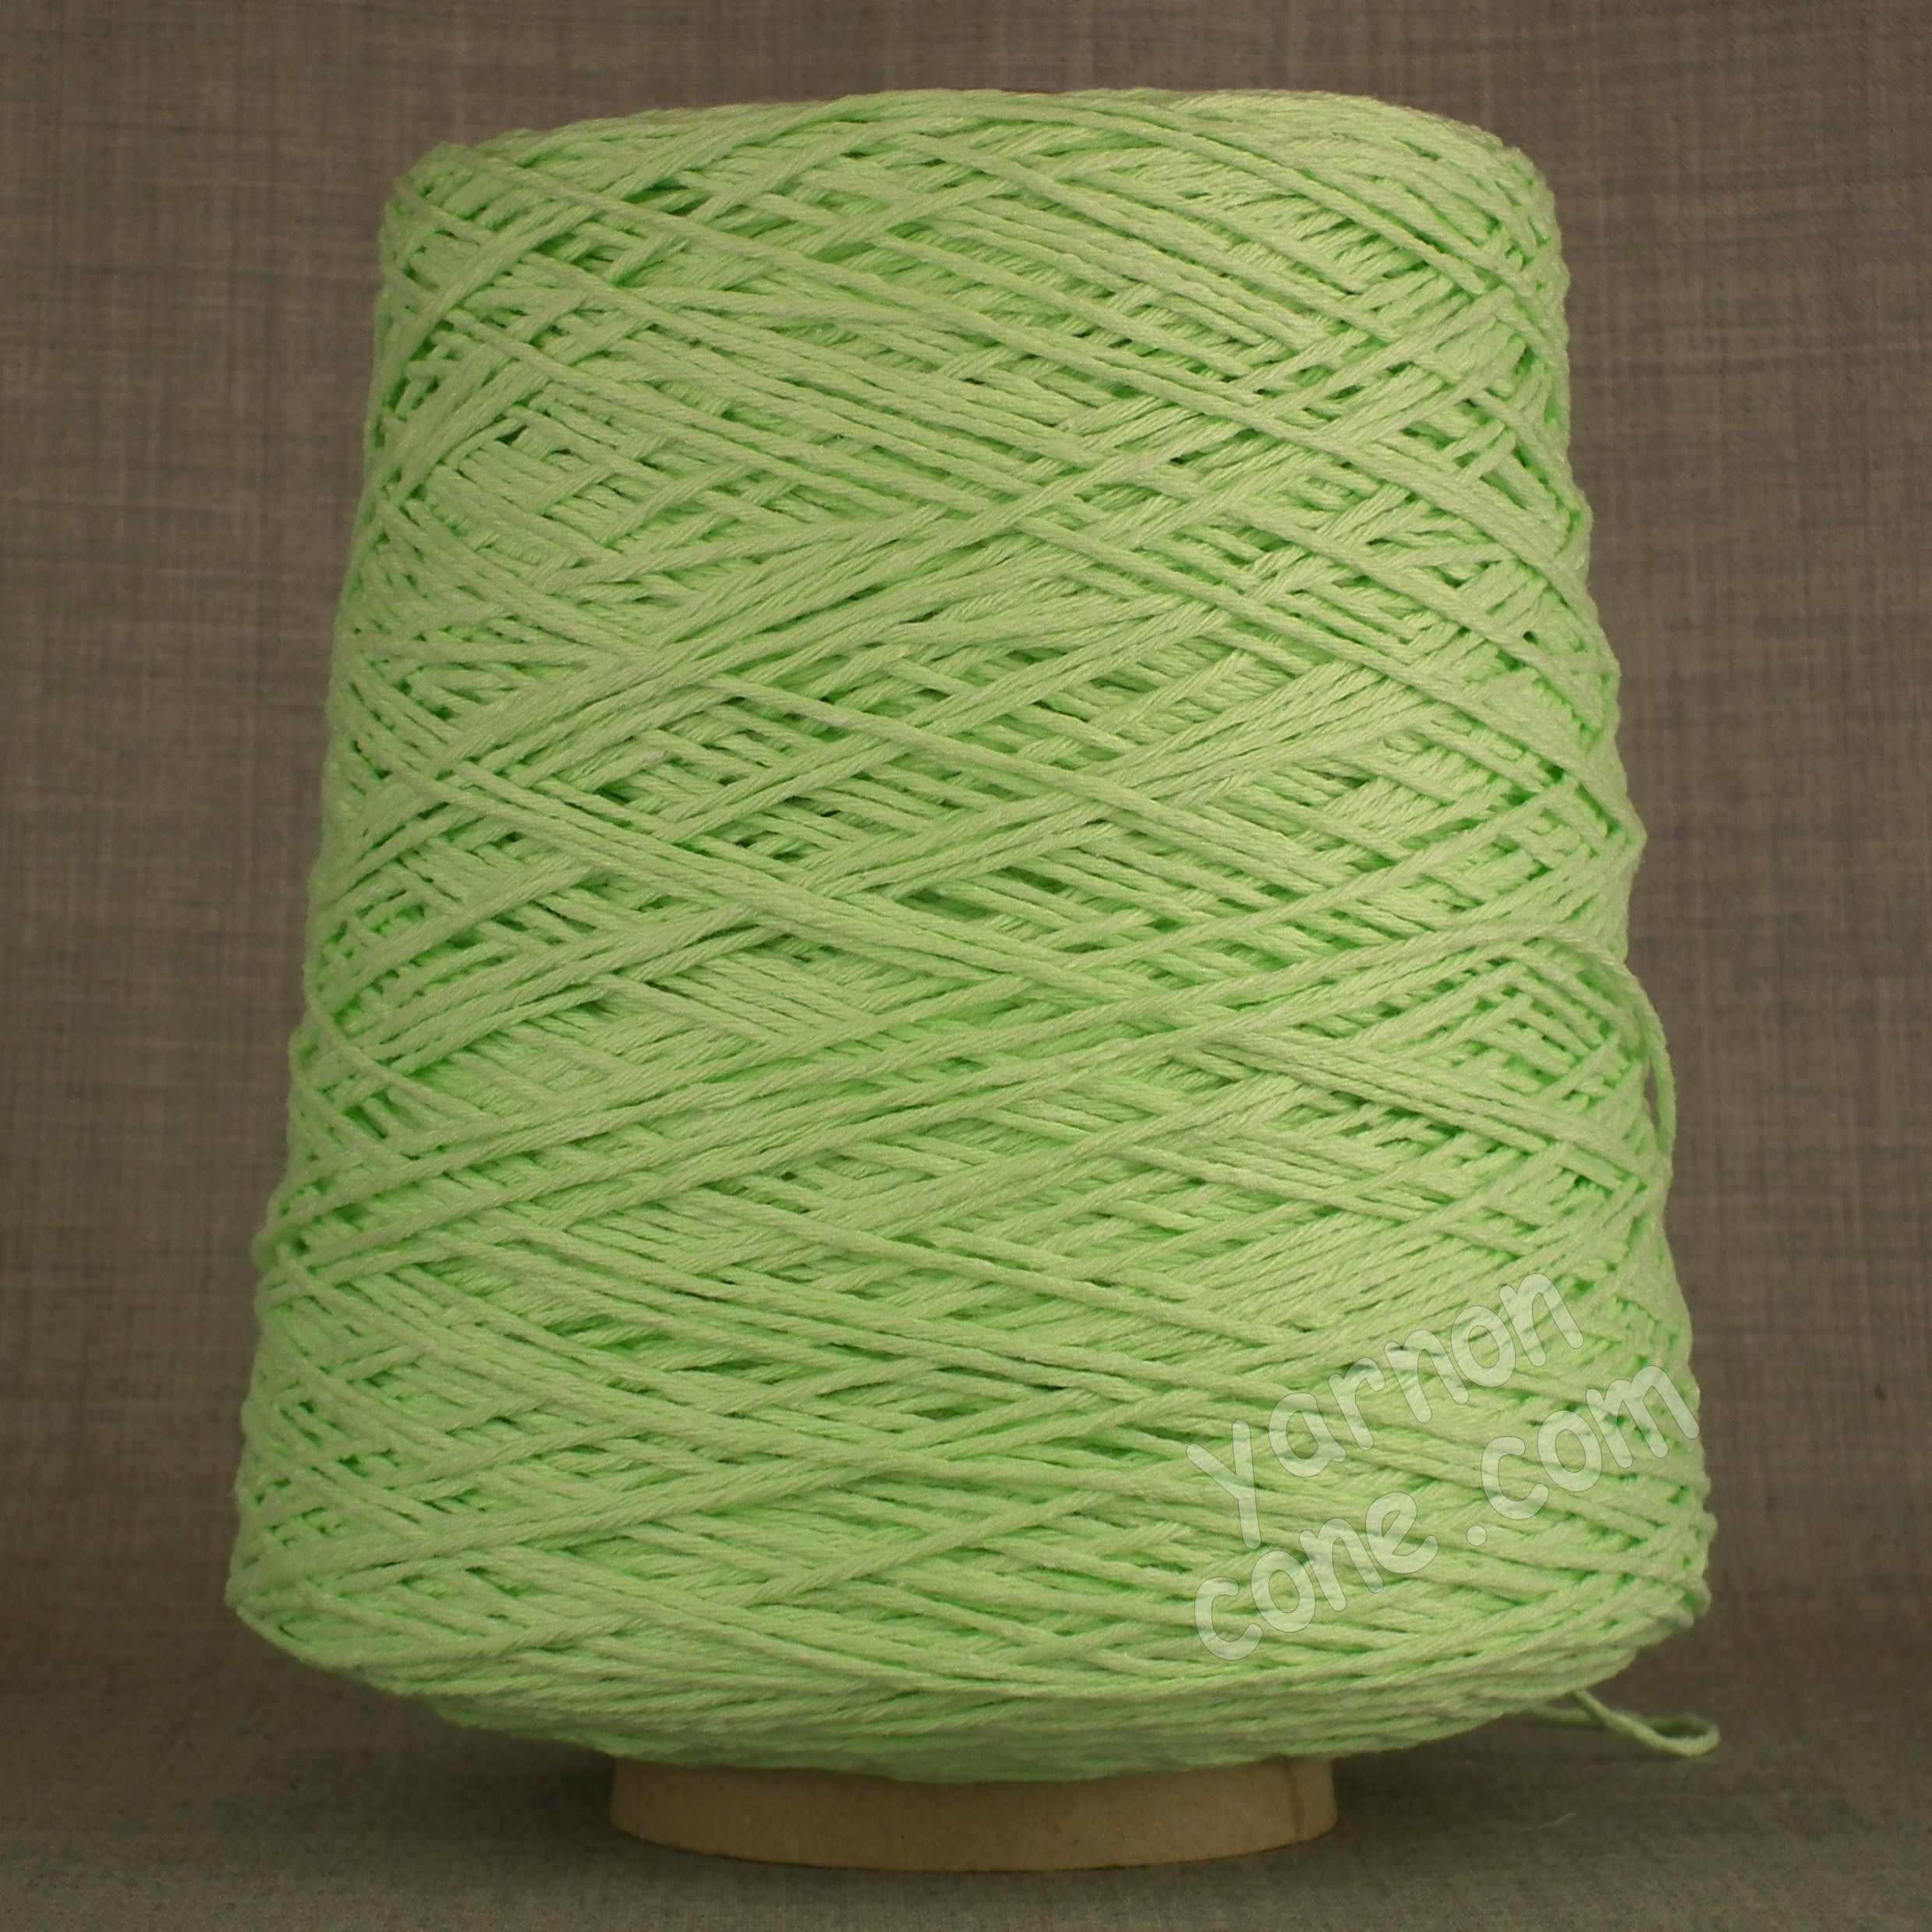 Double knitting DK soft pure cotton yarn on cone hand machine knitting weaving crochet mint green pastel light